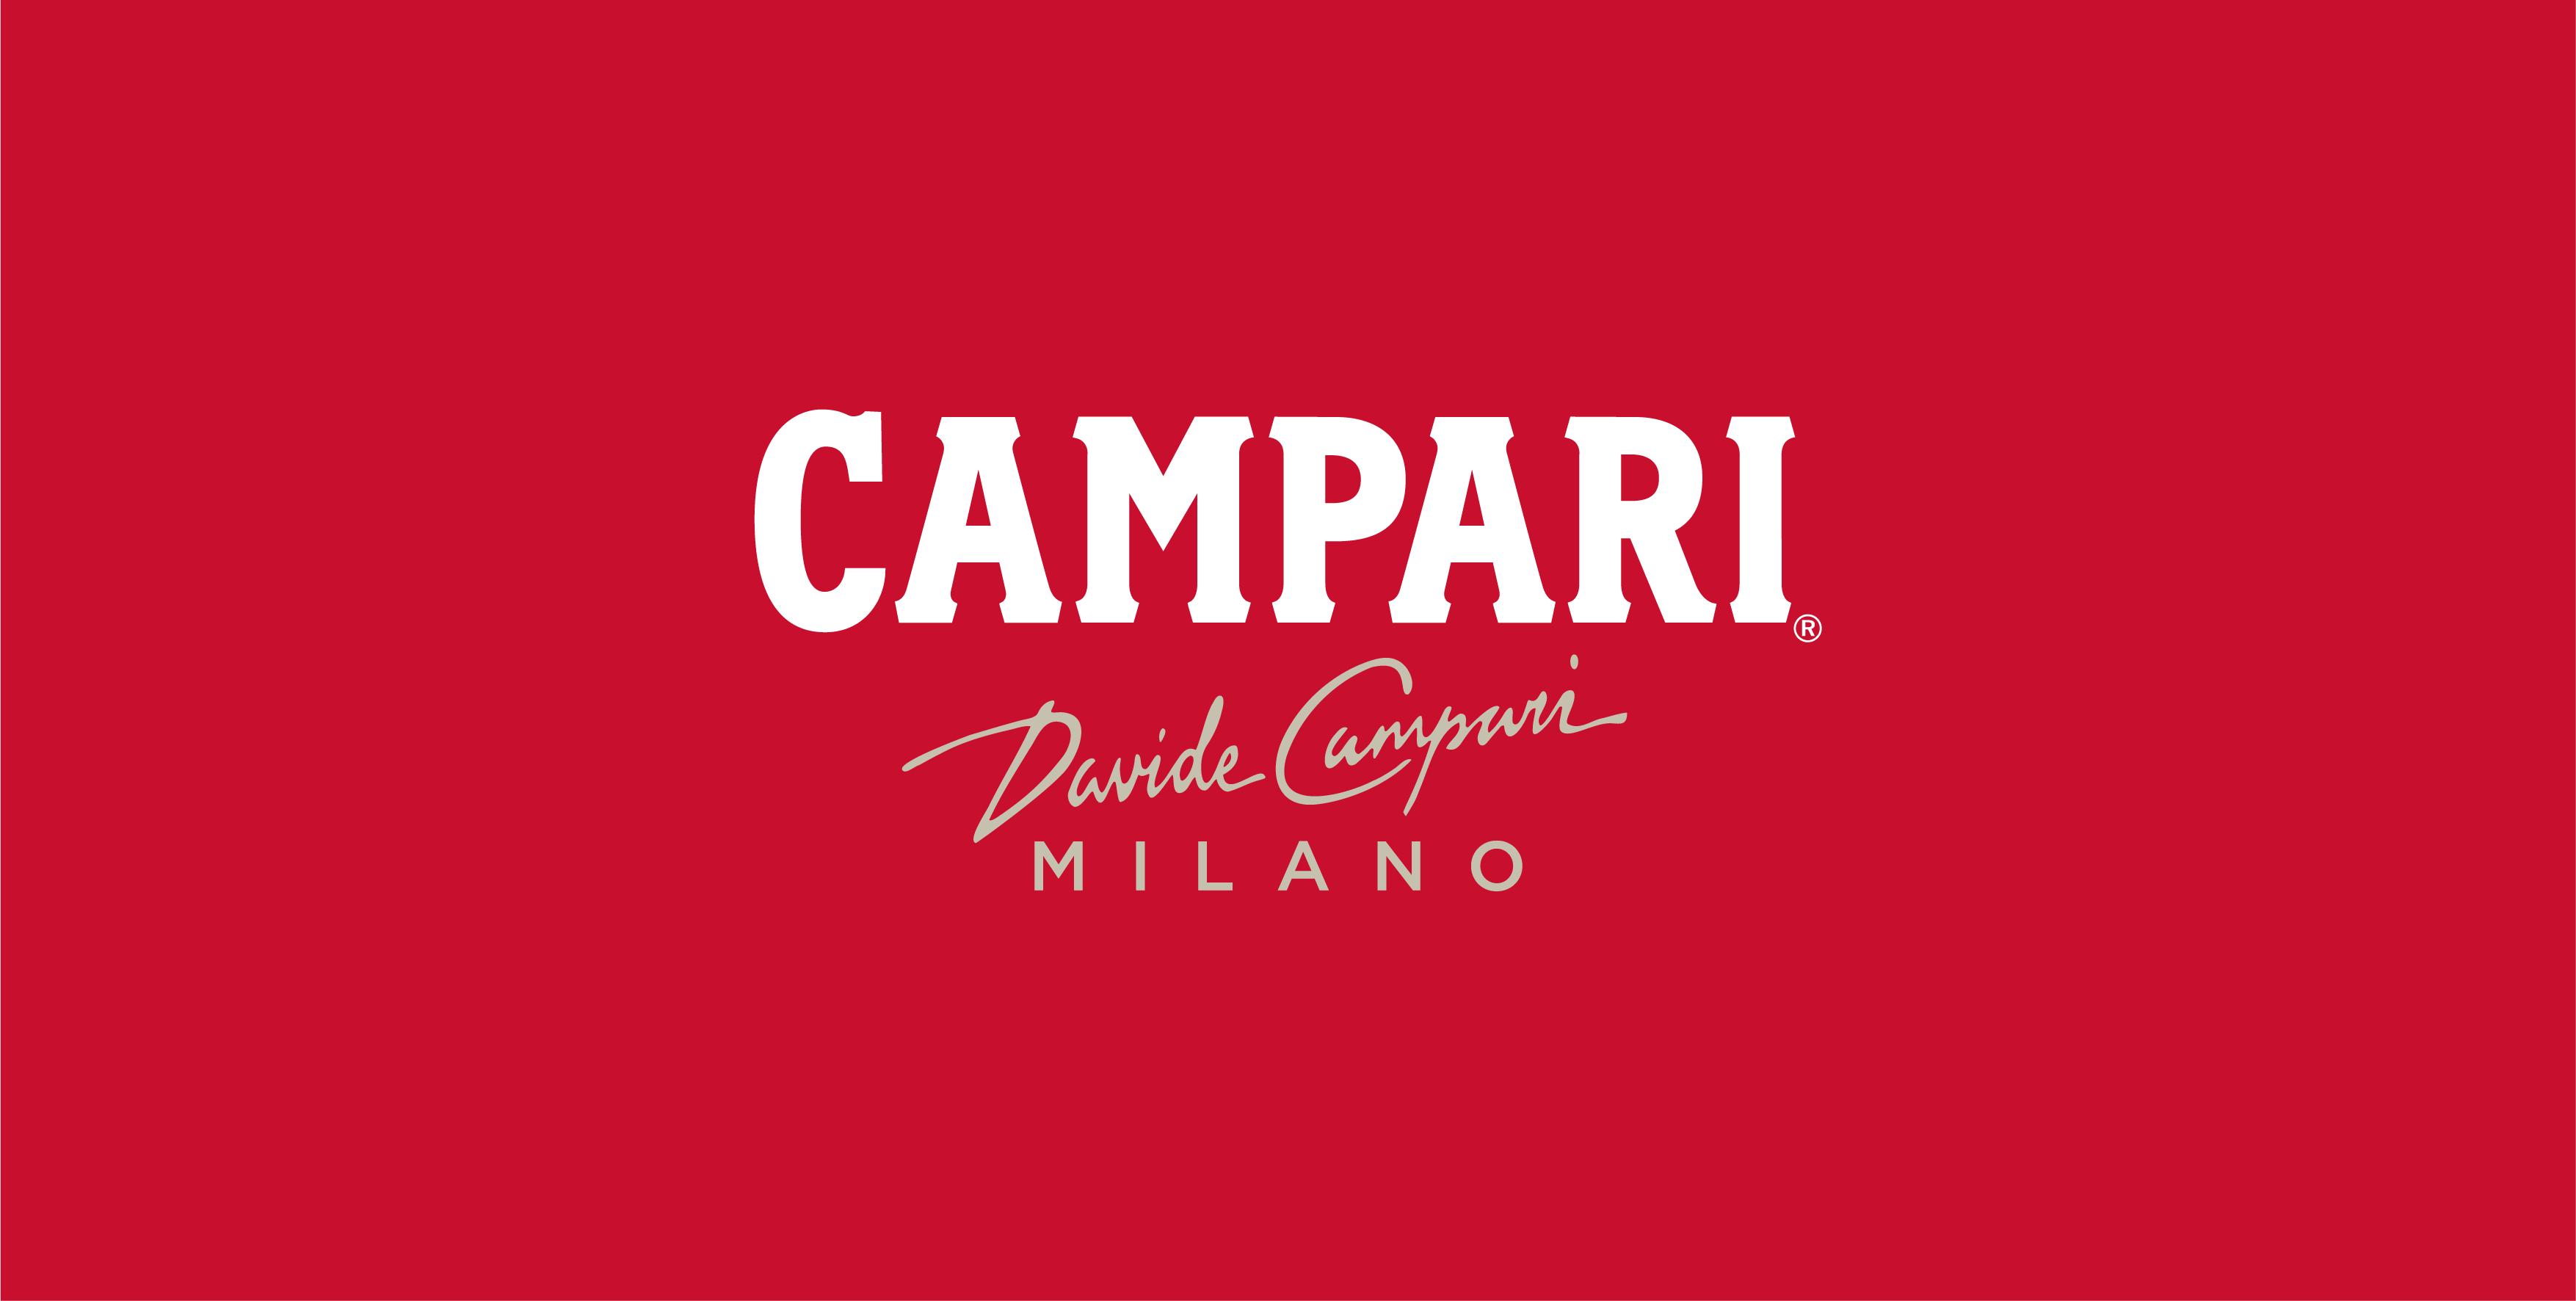 campari logo